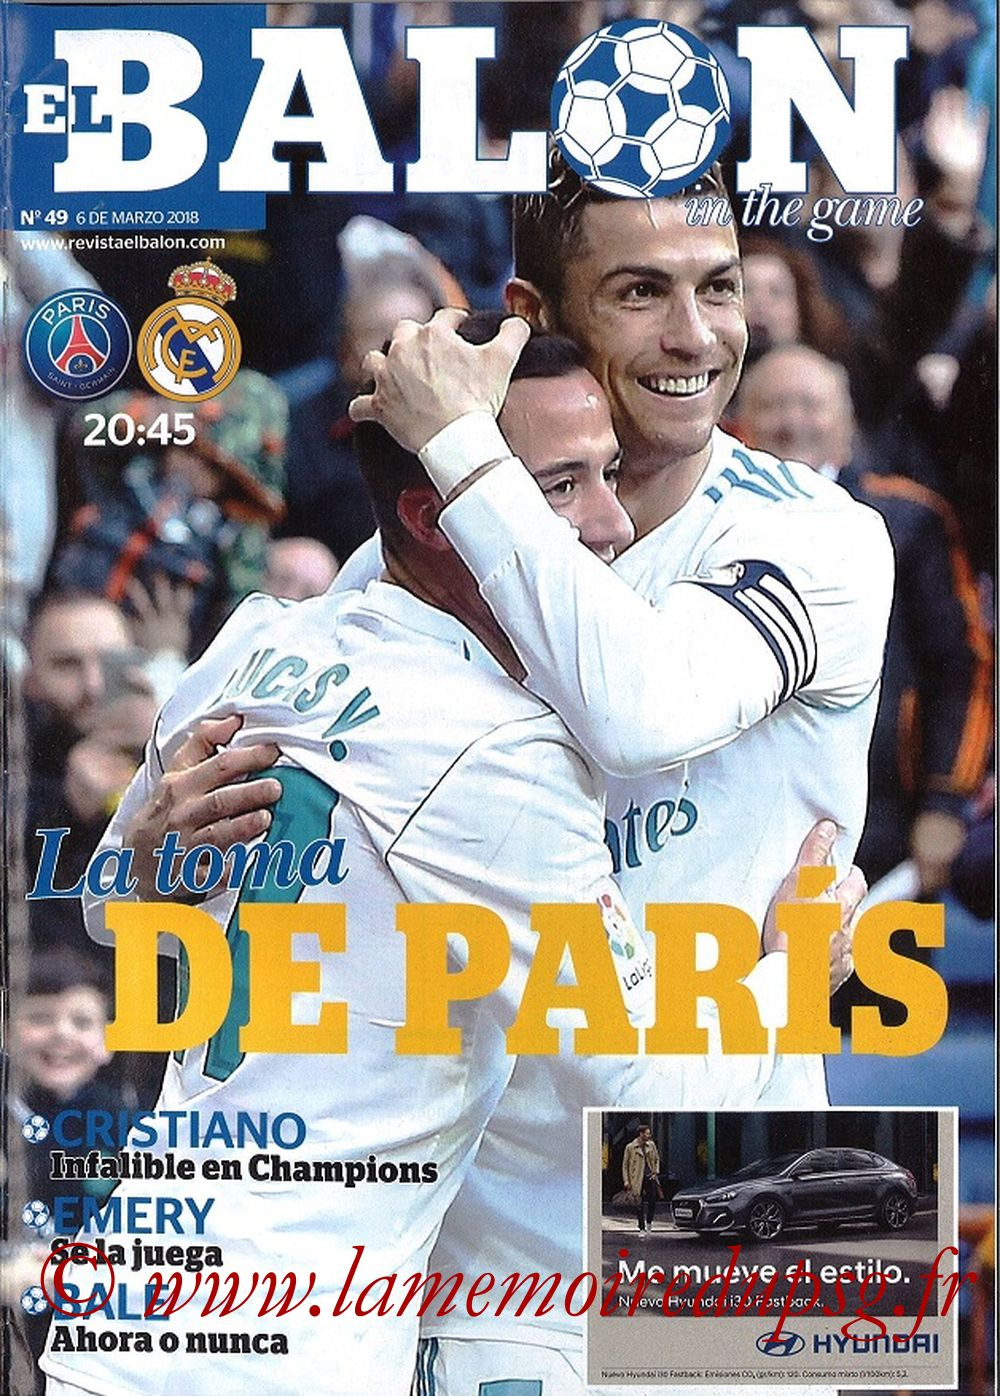 2018-03-06  PSG-Real Madrid (8ème Retour C1, El Balon in the game N°49)